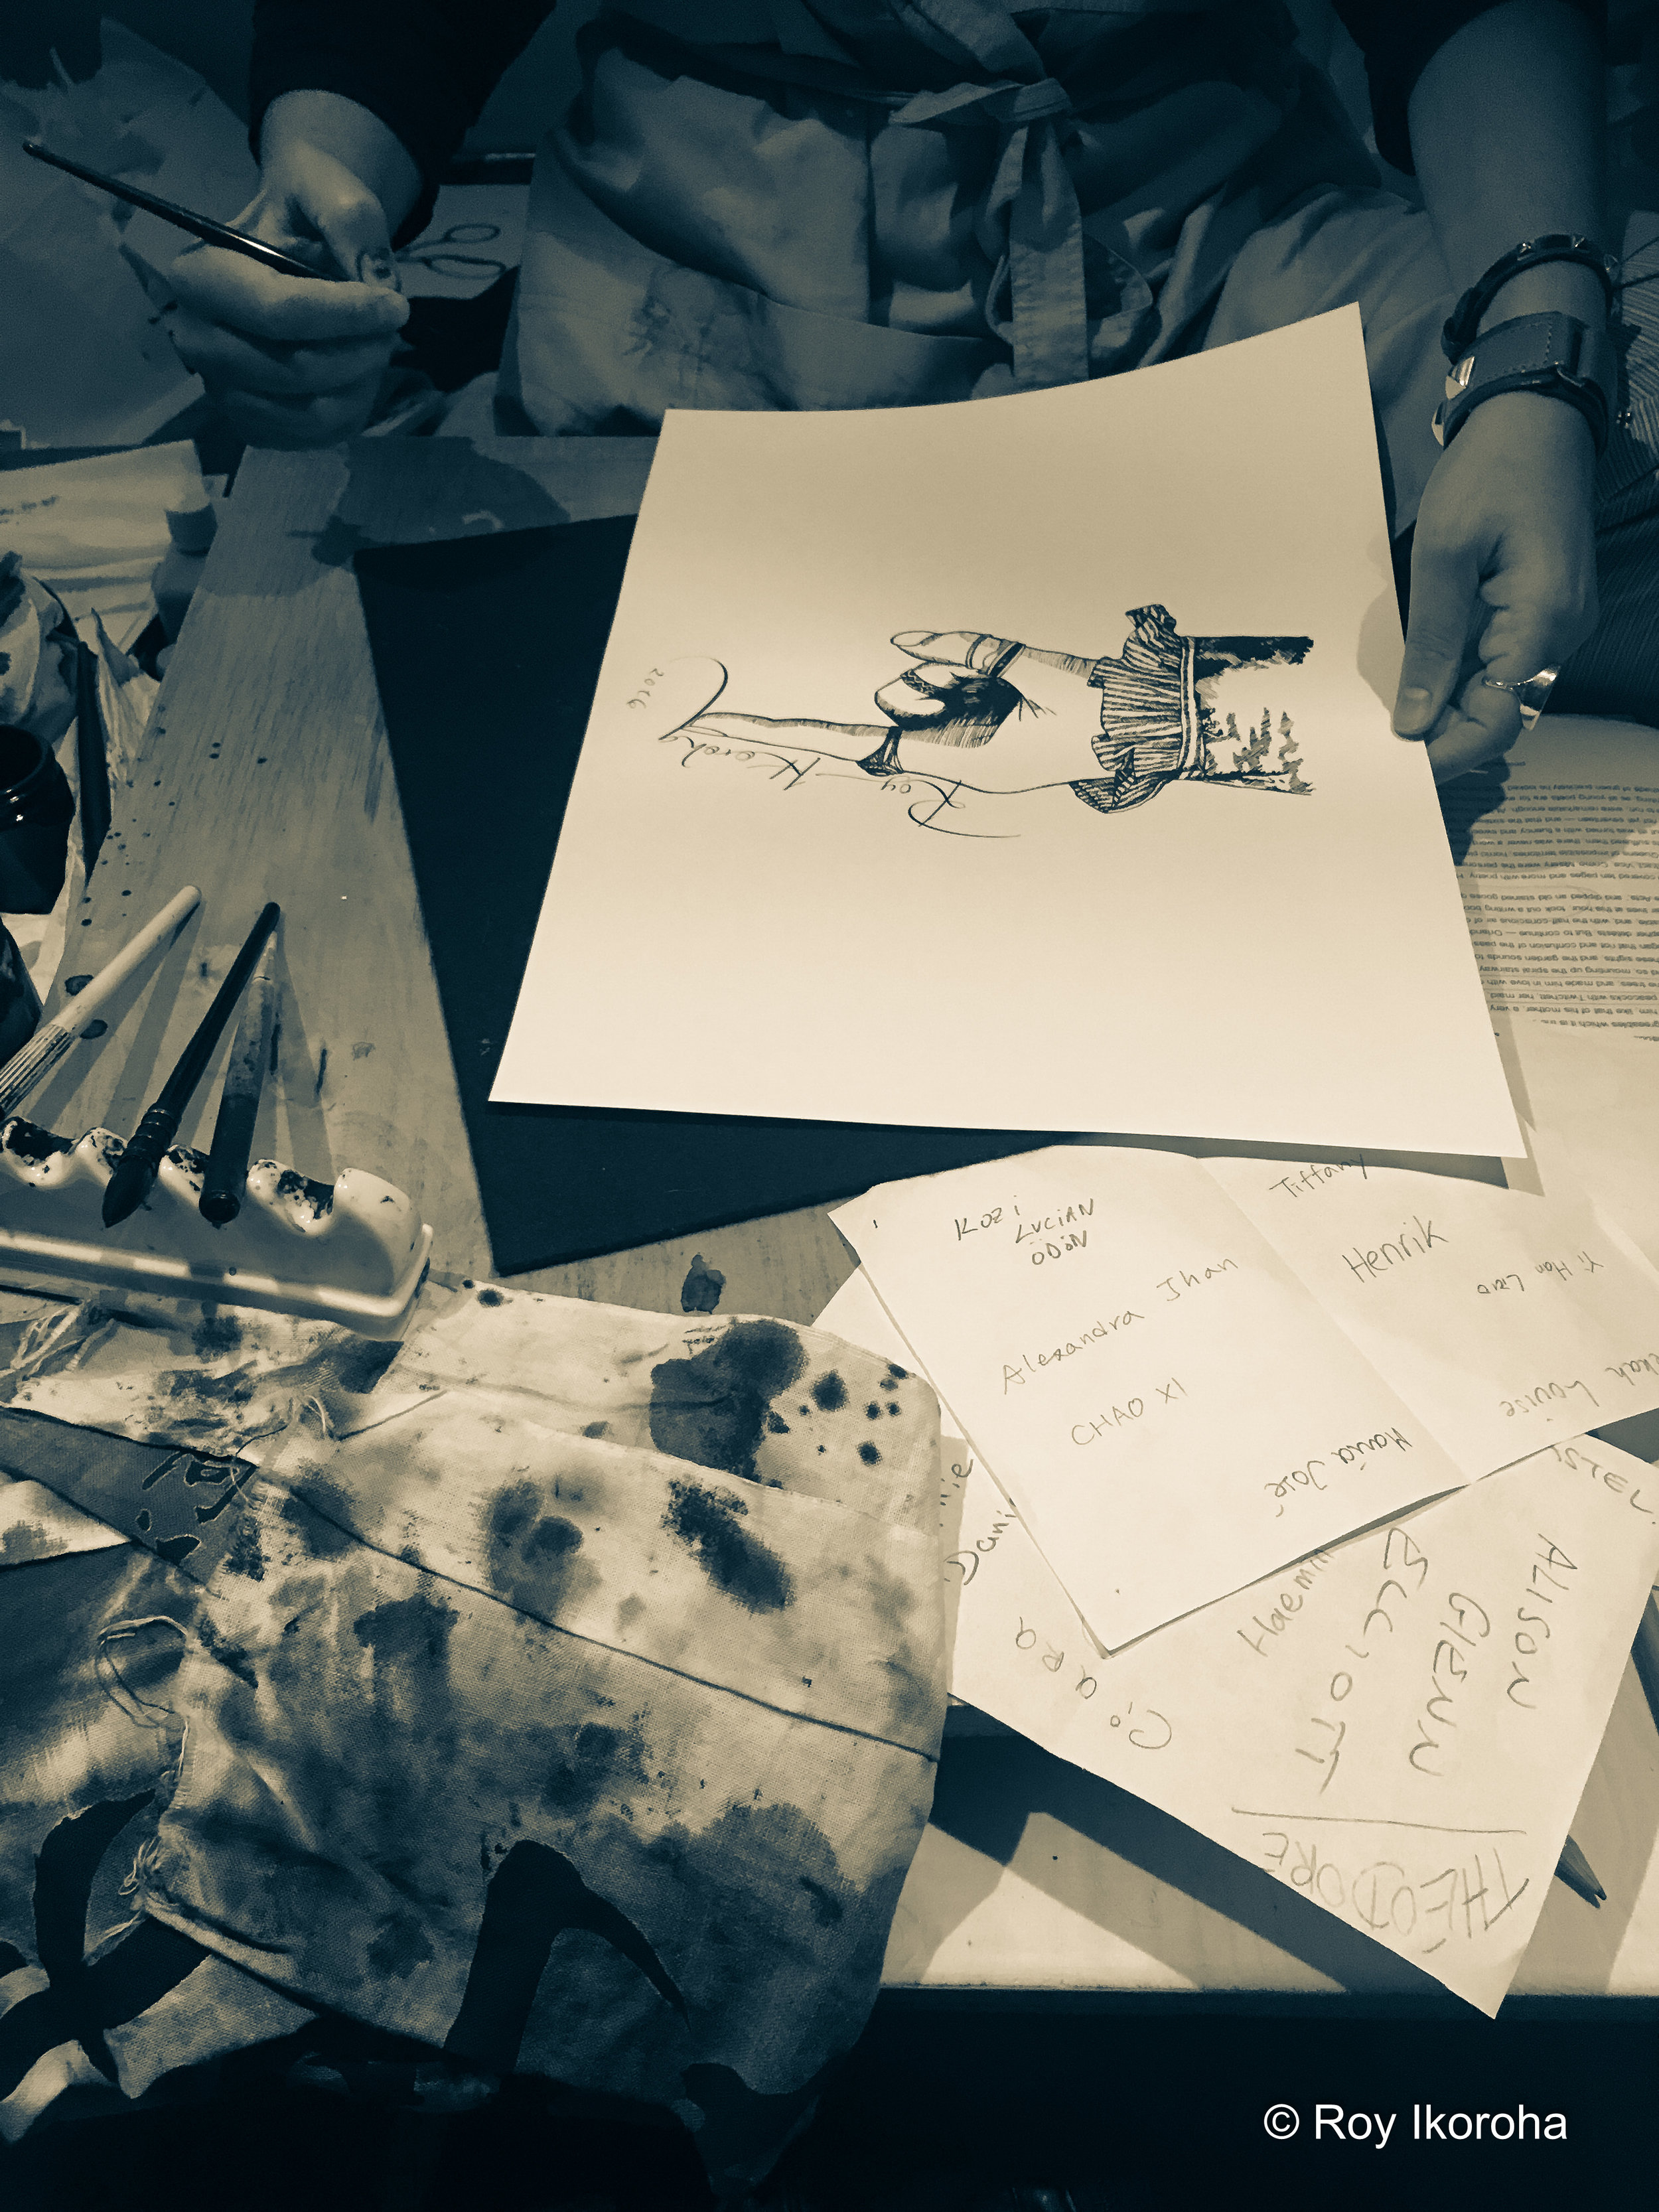 Calligrapher Rosalind Wyatt working on some artwork for me | Burberry Makers House, Manette Street, London